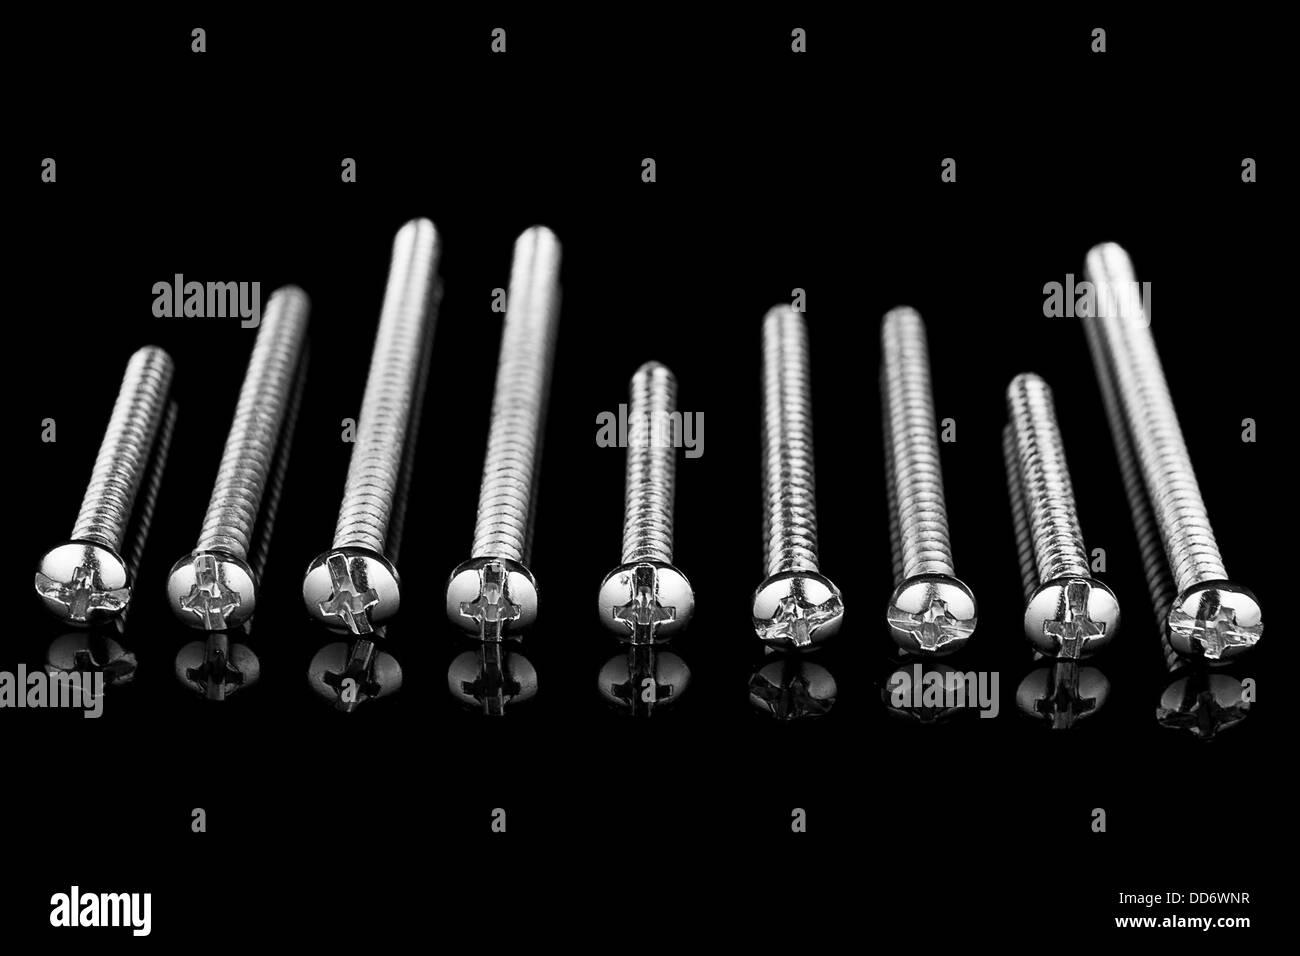 Screws on Black background - Stock Image